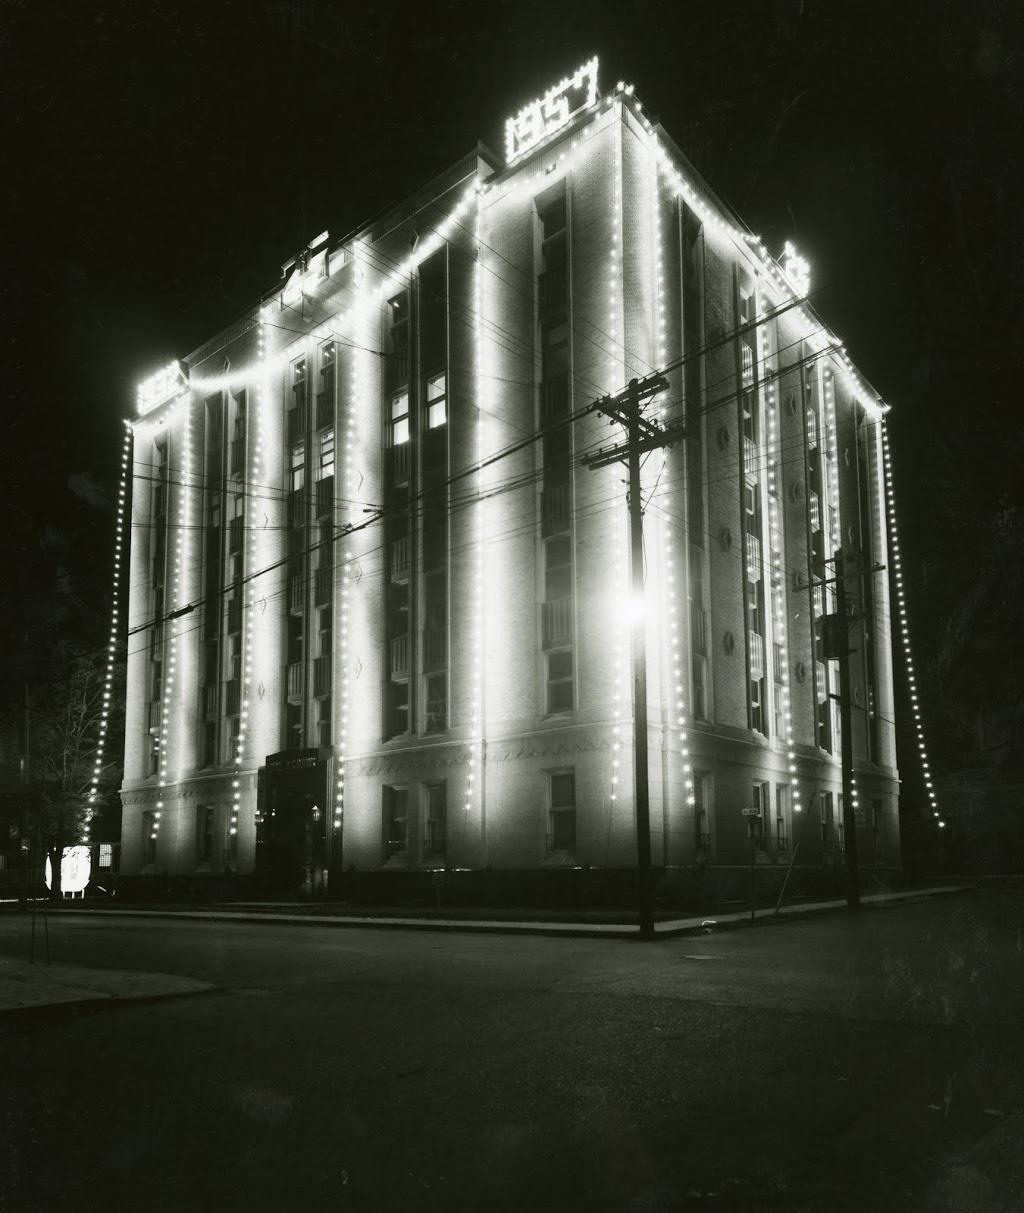 Édifice Desjardins | museum | 59 Avenue Bégin, Lévis, QC G6V 4C3, Canada | 4188352090 OR +1 418-835-2090